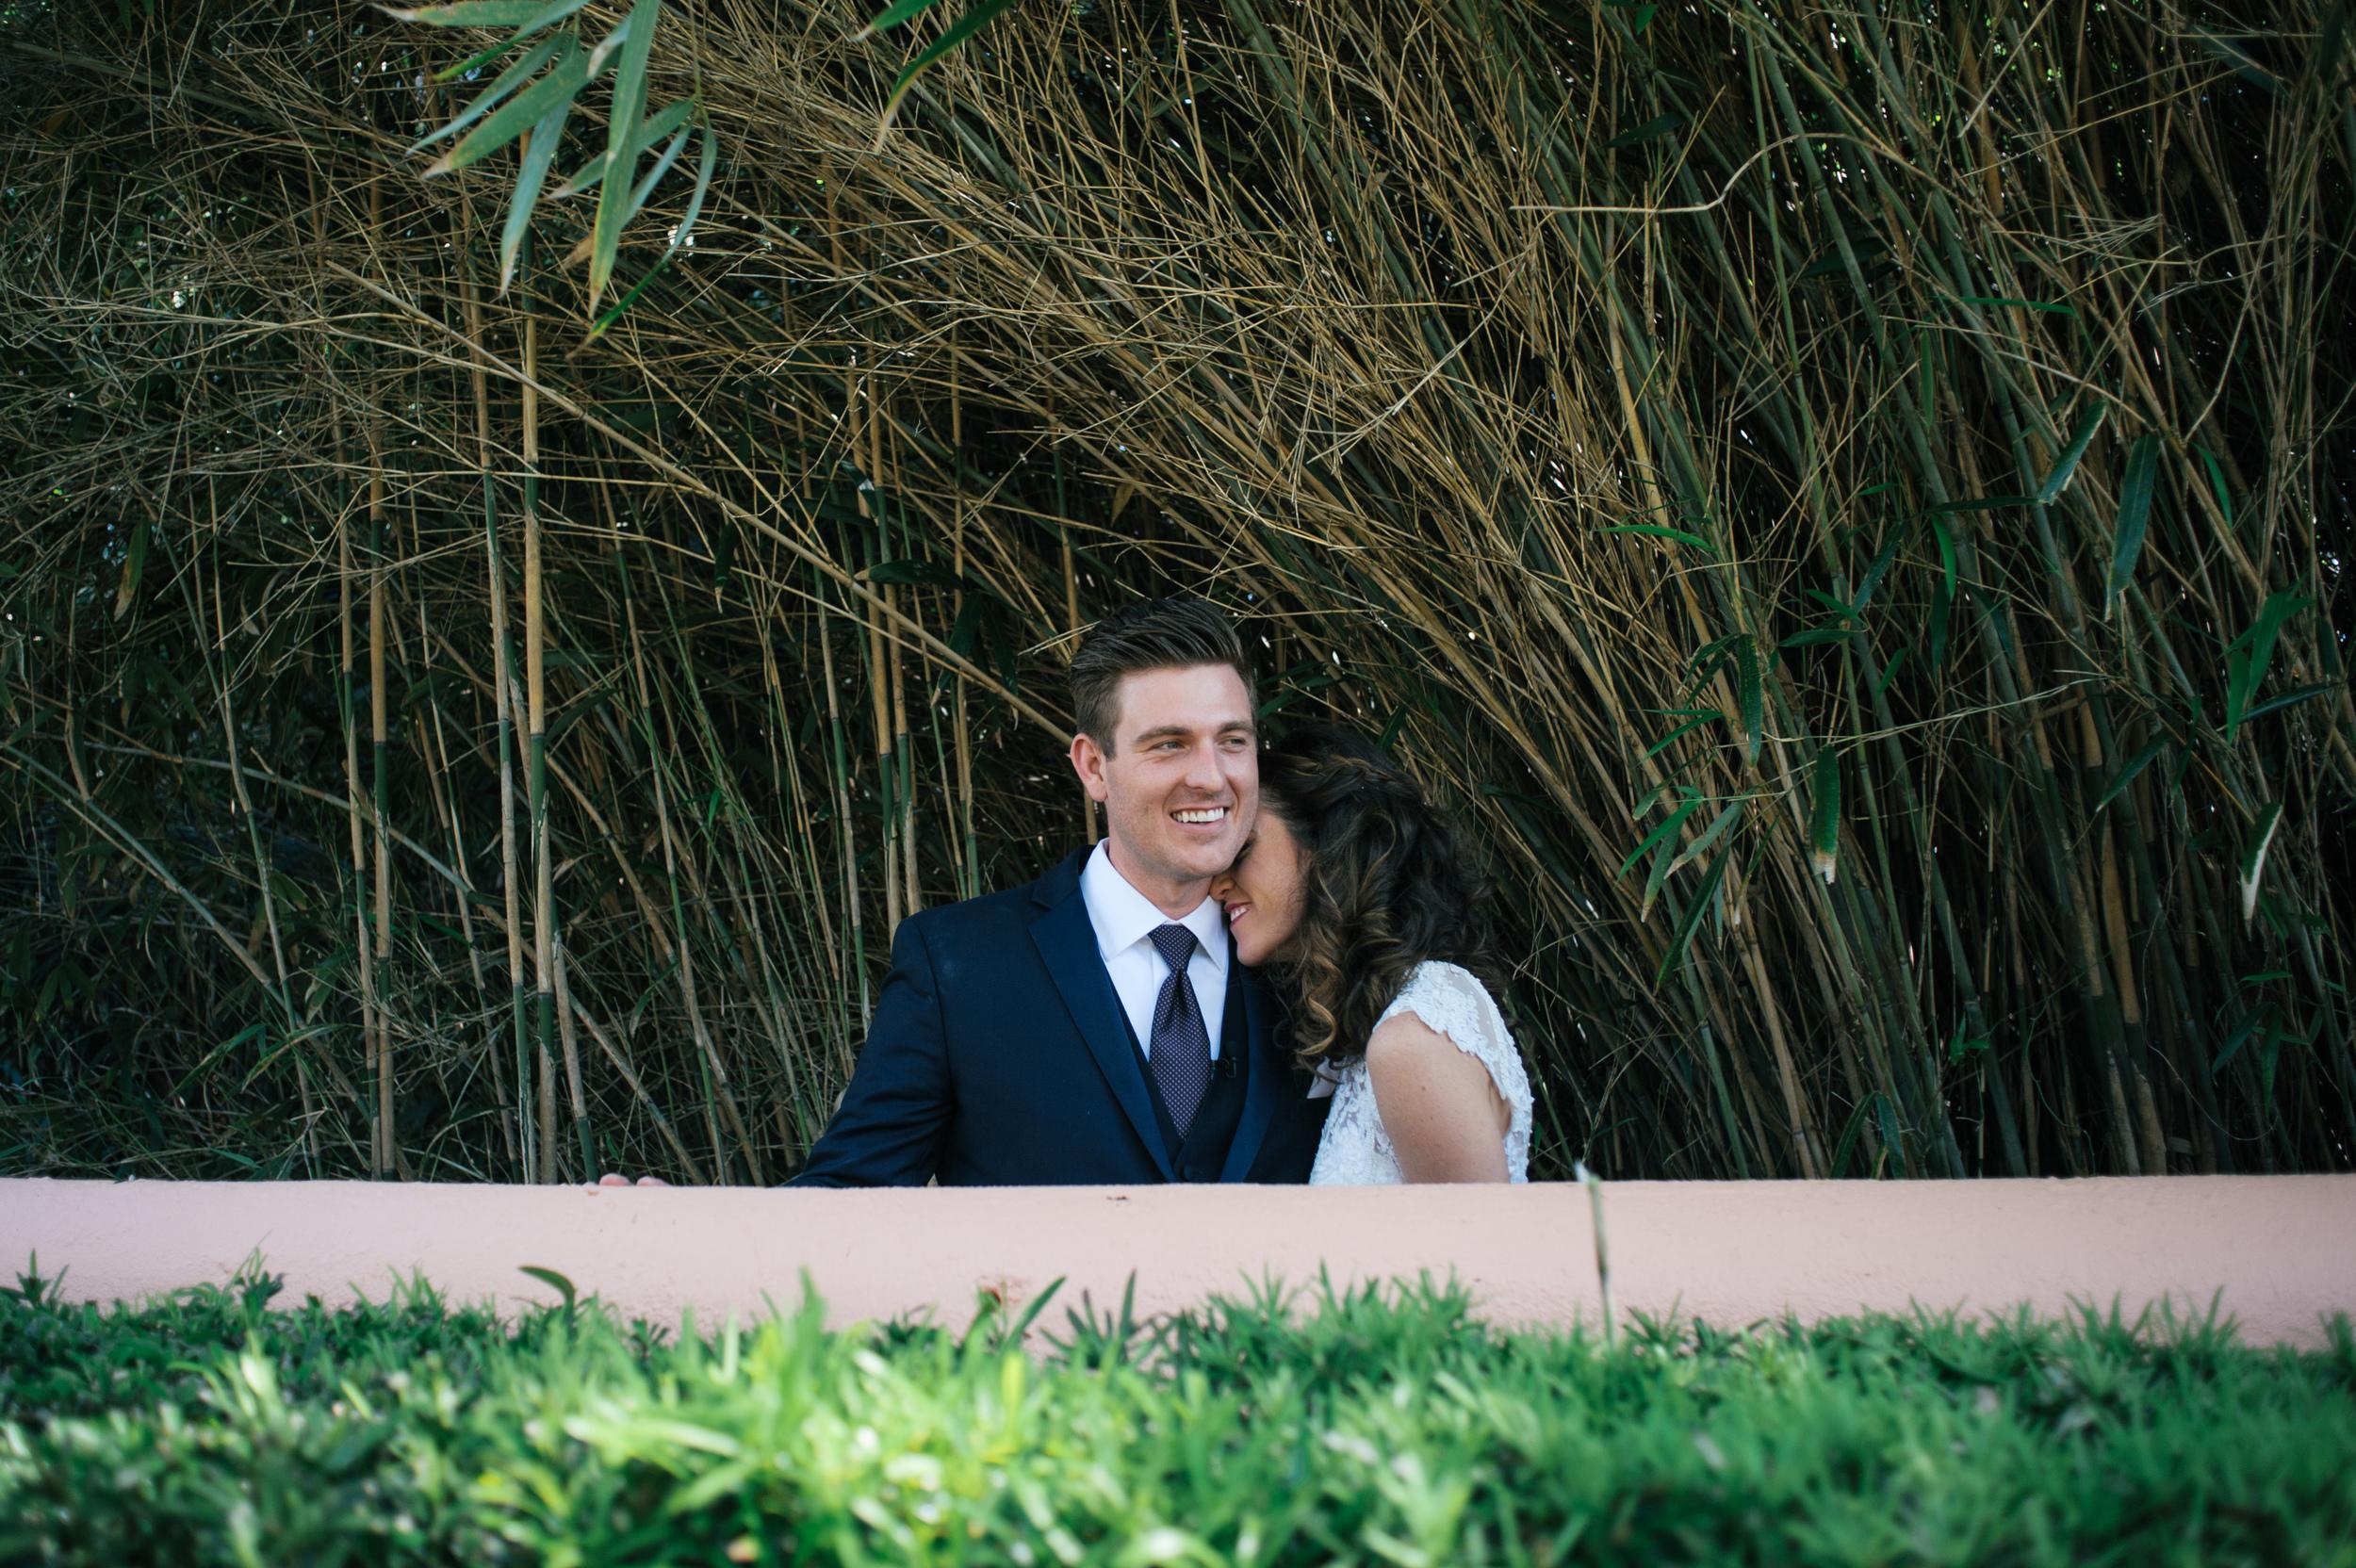 kadi-and-matt-carroll-april-9-2016-jekyl-island-wedding-m-newsom-photography- (252 of 744).jpg